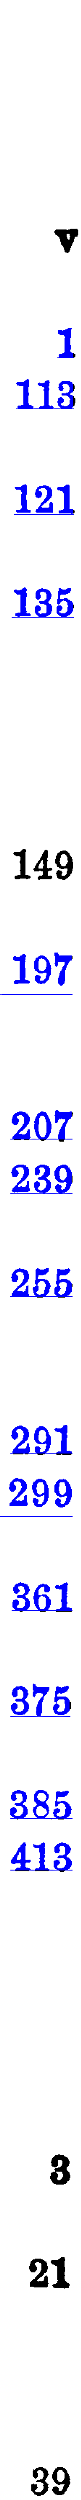 [merged small][merged small][merged small][merged small][merged small][merged small][merged small][merged small][merged small][merged small][merged small][ocr errors][ocr errors][ocr errors][merged small][ocr errors]